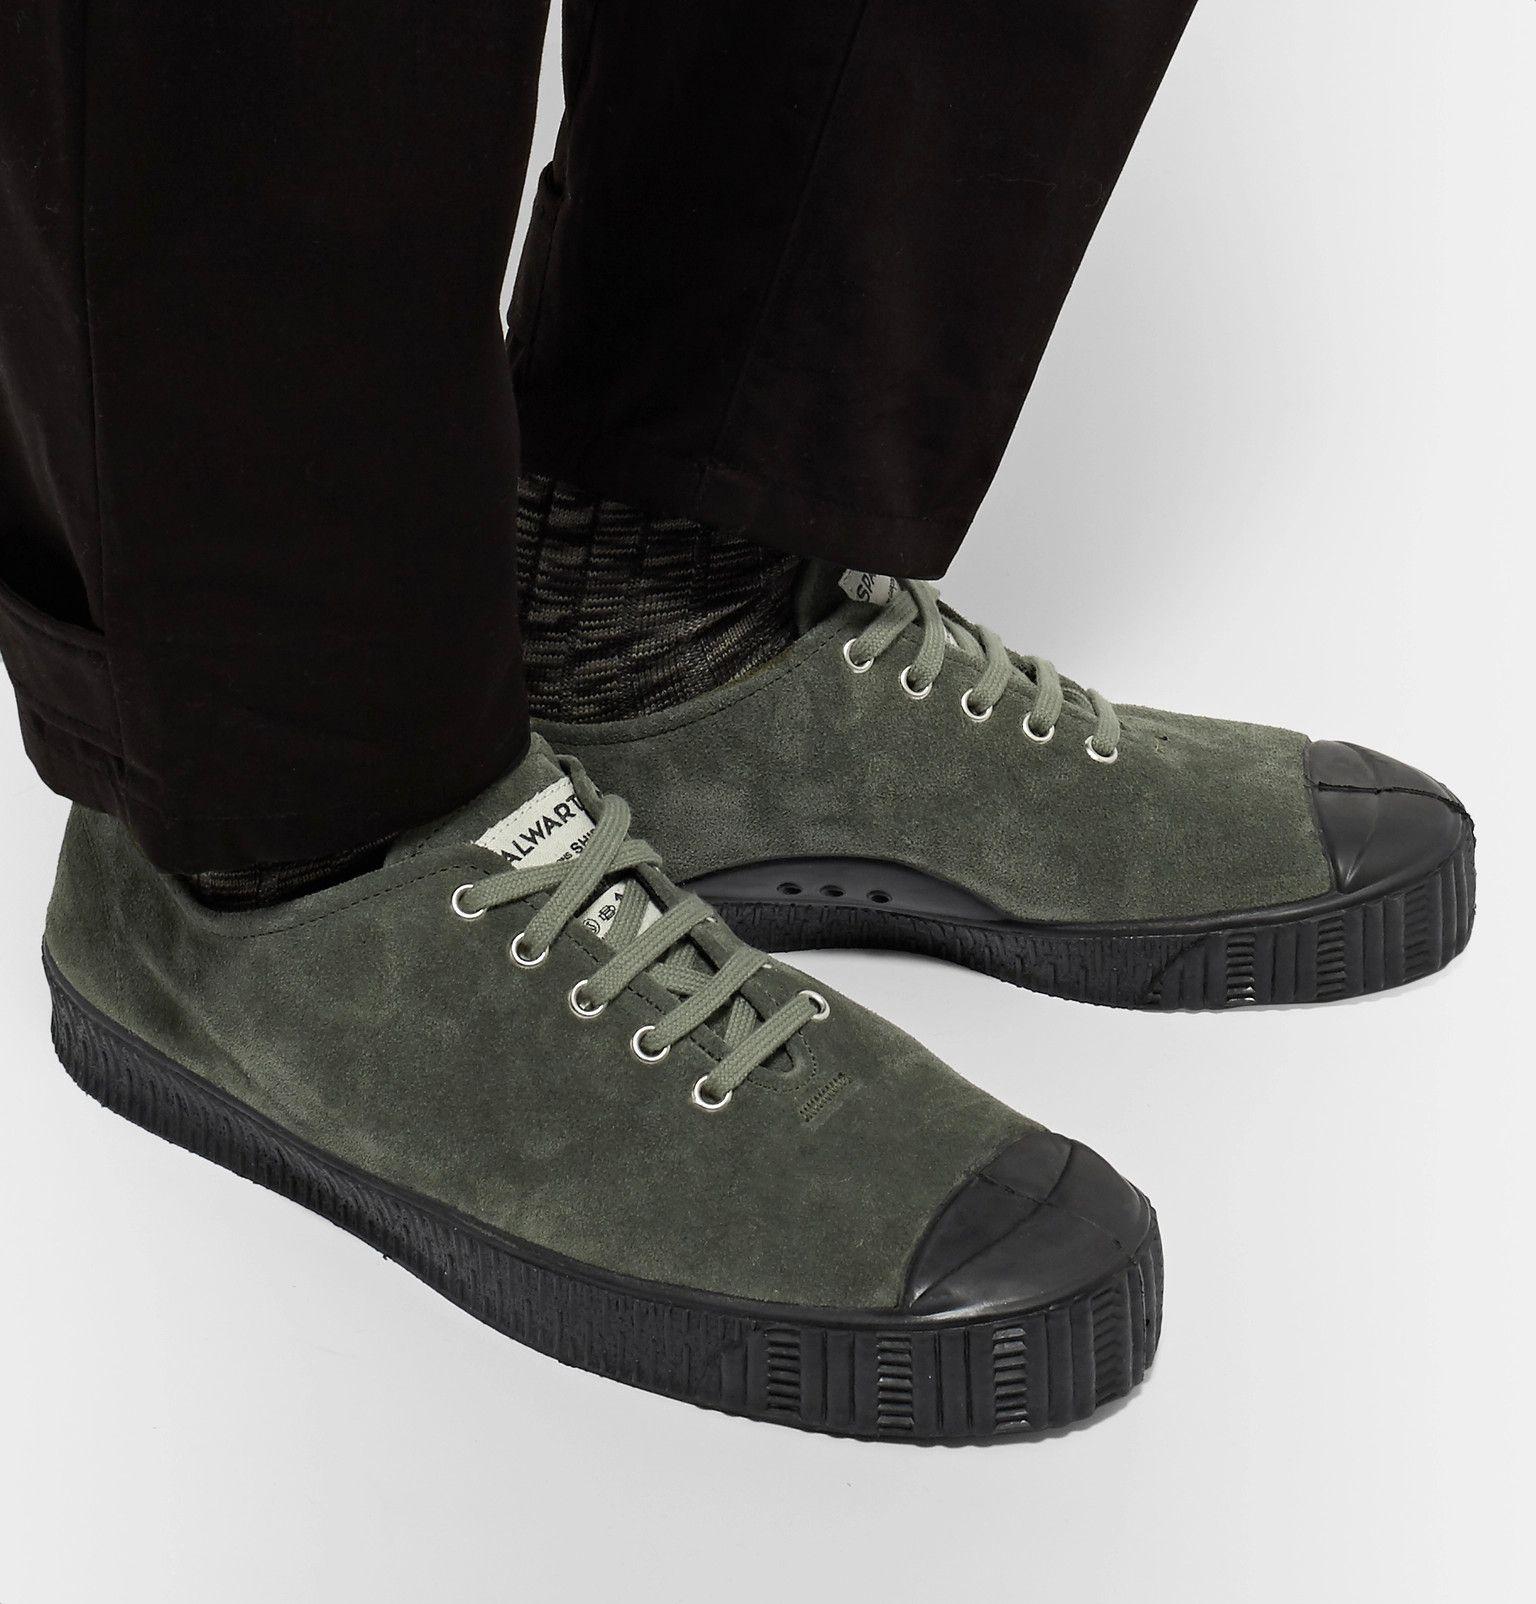 173fad4d8e Comme des Garçons SHIRT - + Spalwart Special V Low Rubber-Trimmed Suede  Sneakers